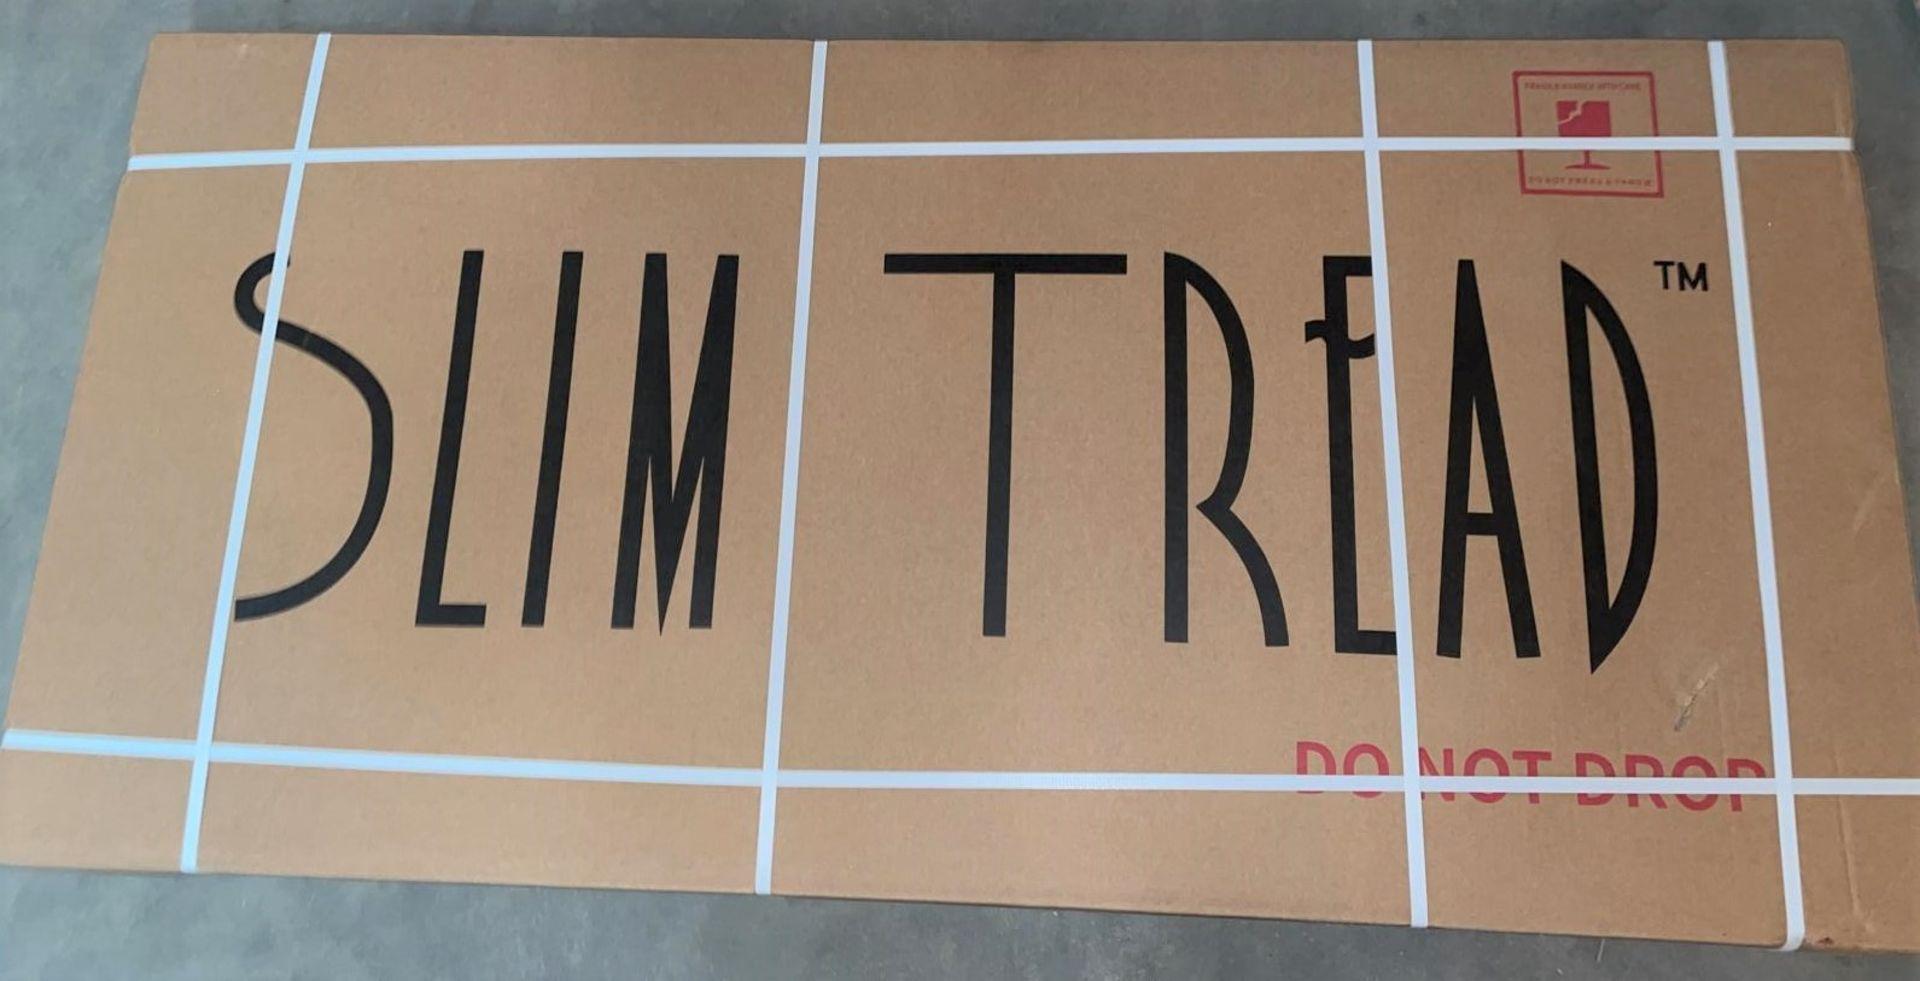 10 x Slim Tread Ultra Thin Smart Treadmill Running Machine - Brand New Sealed Stock - RRP £799 Each! - Image 11 of 24